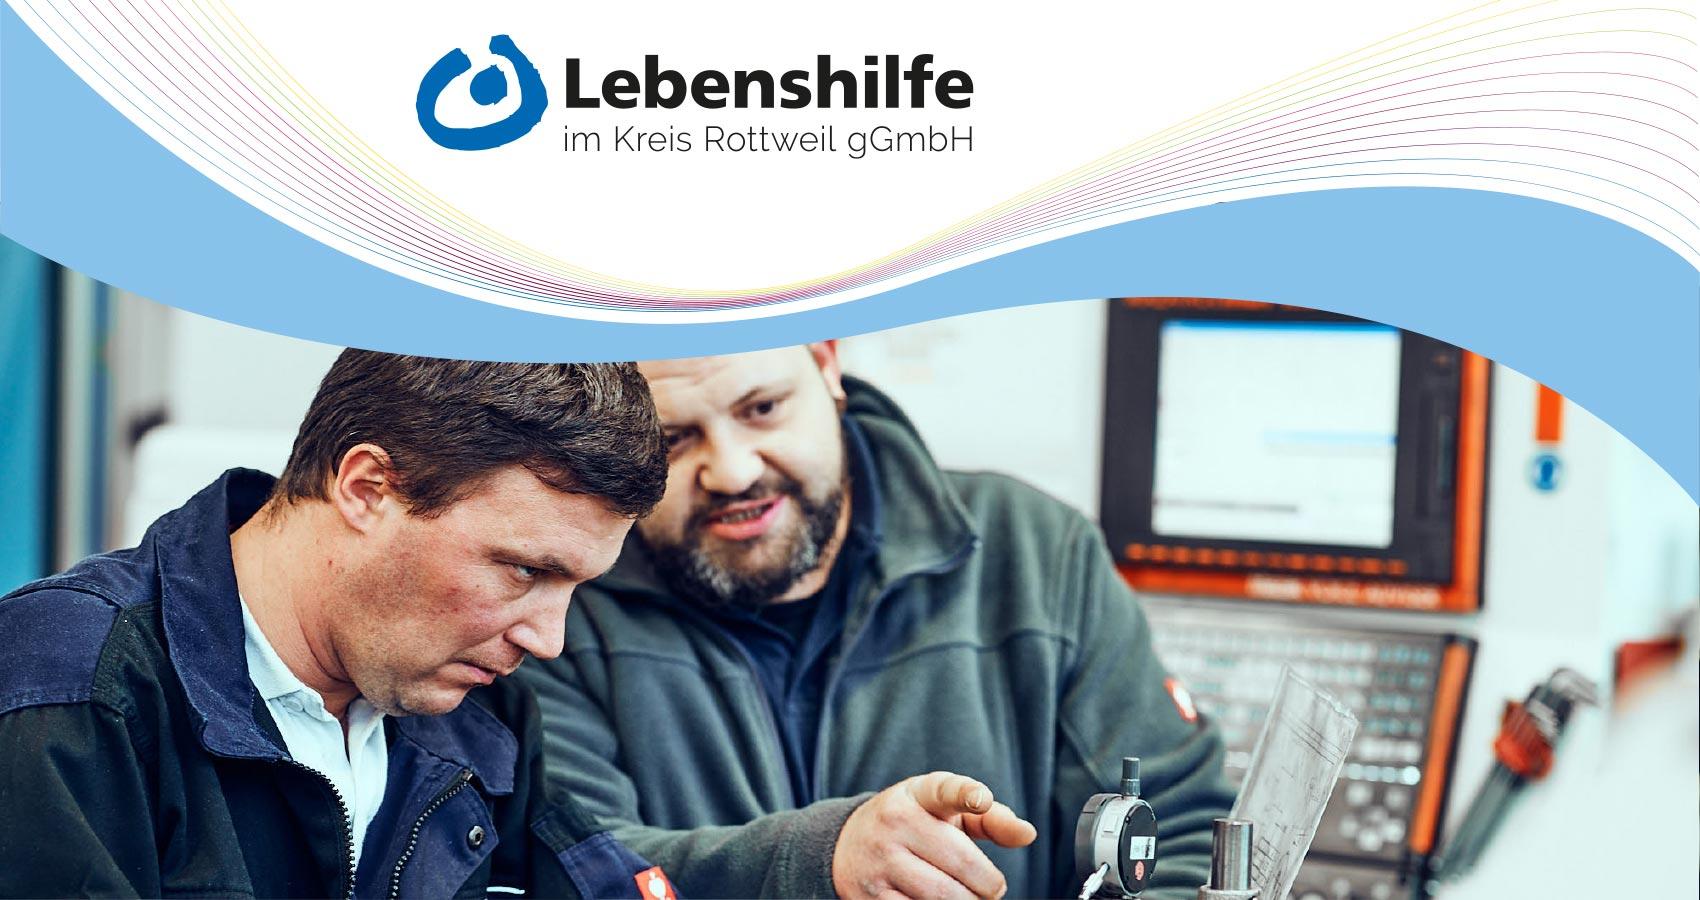 Lebenshilfe im Kreis Rottweil gGmbH - Arbeitsbereich Metall